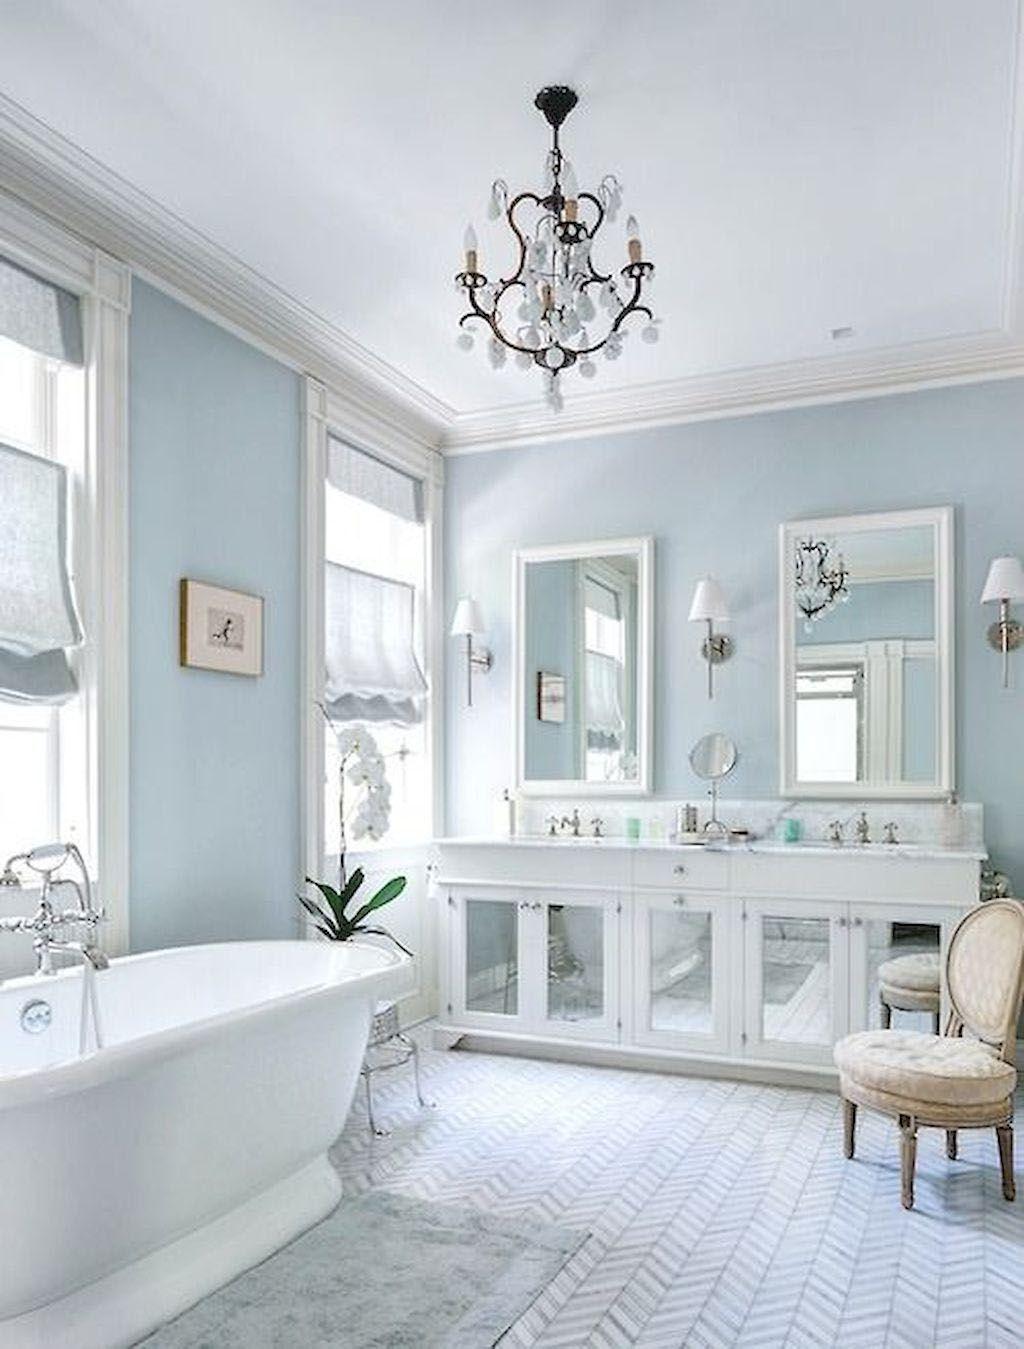 Ways To Decorate A Bathroom Colour Scheme Ideas Uk To Refresh Your Home Luxurybathroomideasuk White Master Bathroom White Bathroom Designs Light Blue Bathroom